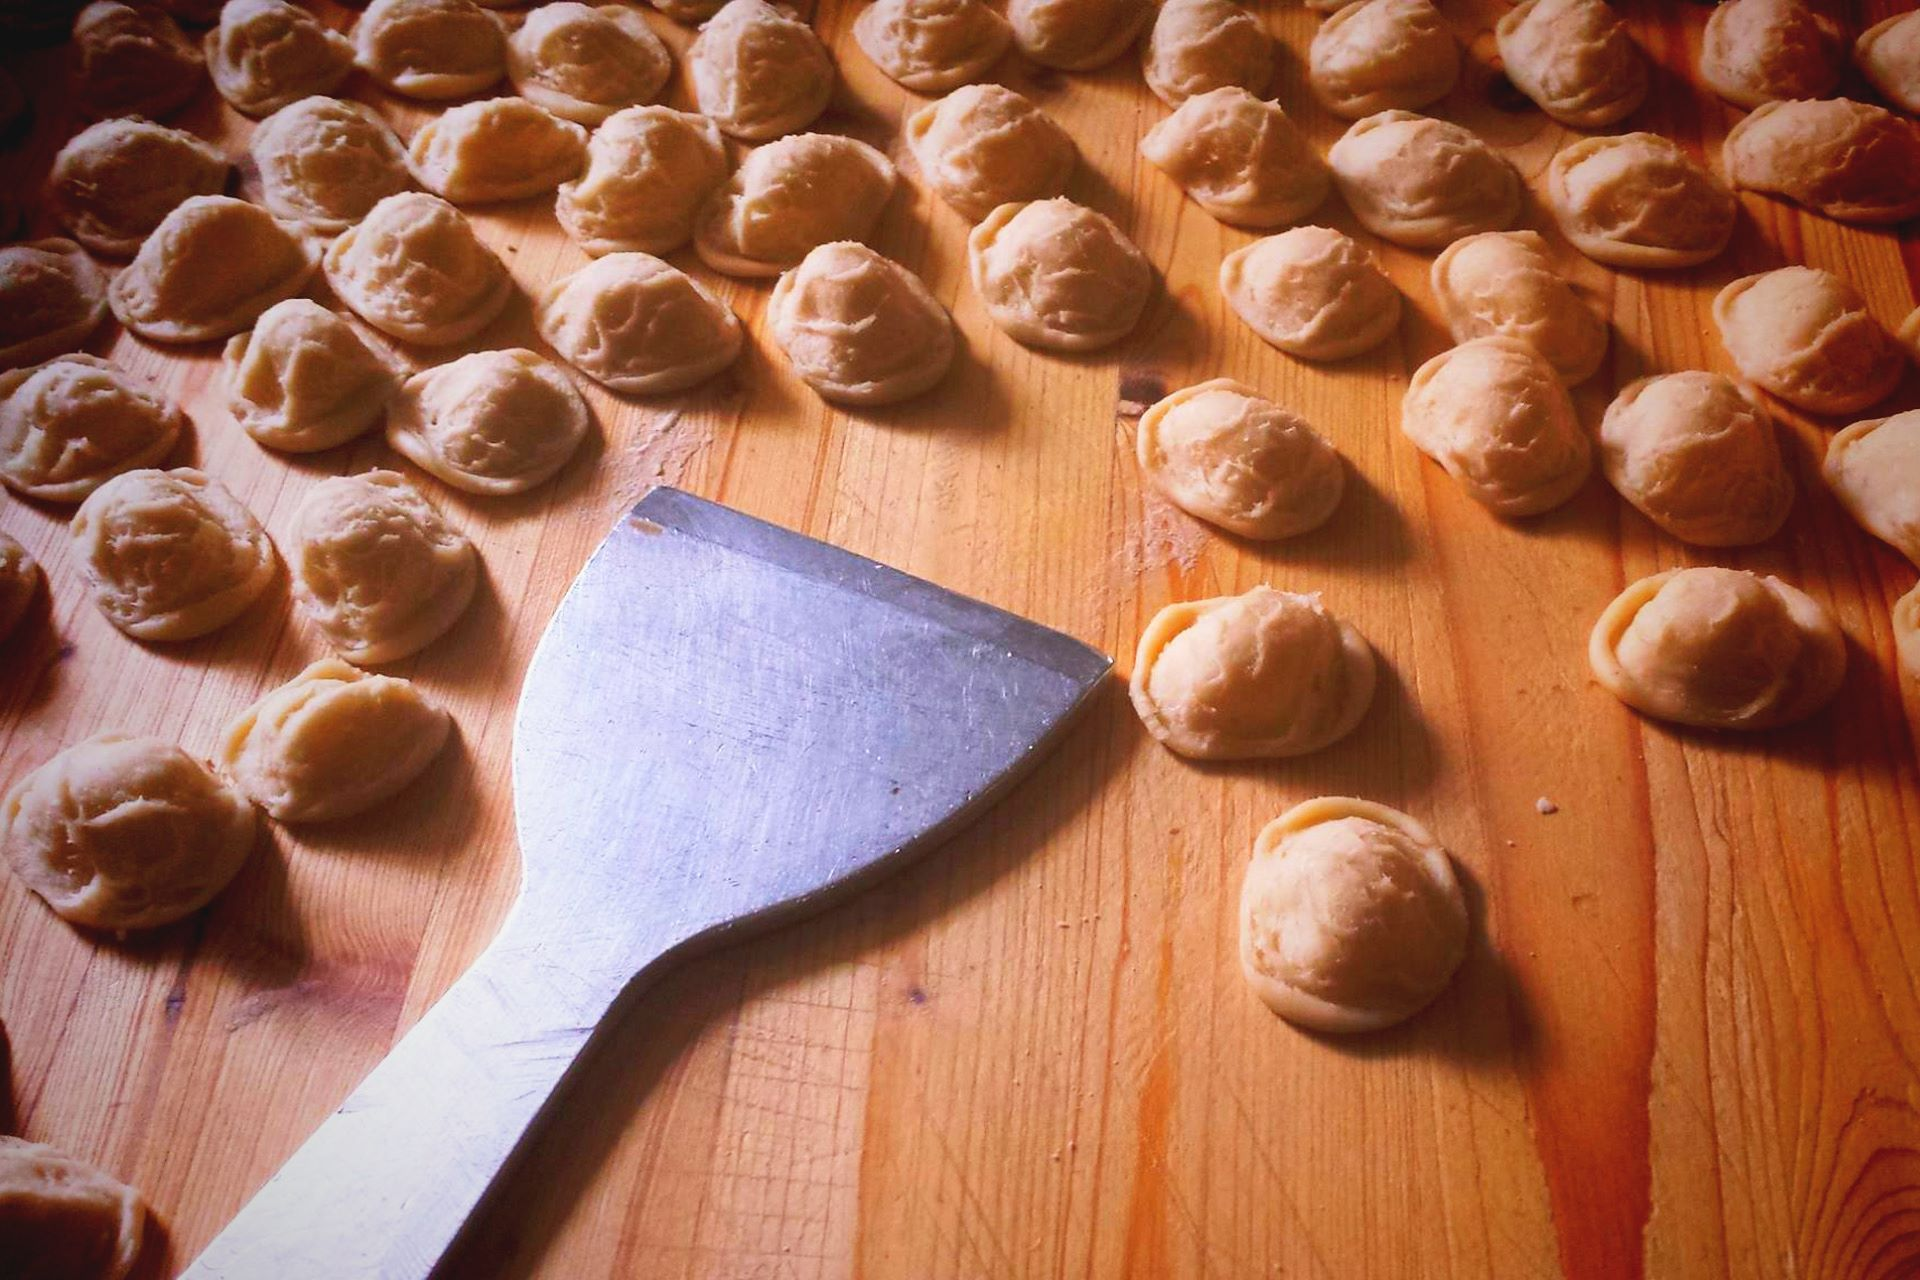 apulia slow travel cooking class orecchiette-apulia-apulien-puglia-cucina pugliese- apulian cuisine-kochkurs-apulische kueche-pasta-nudeln